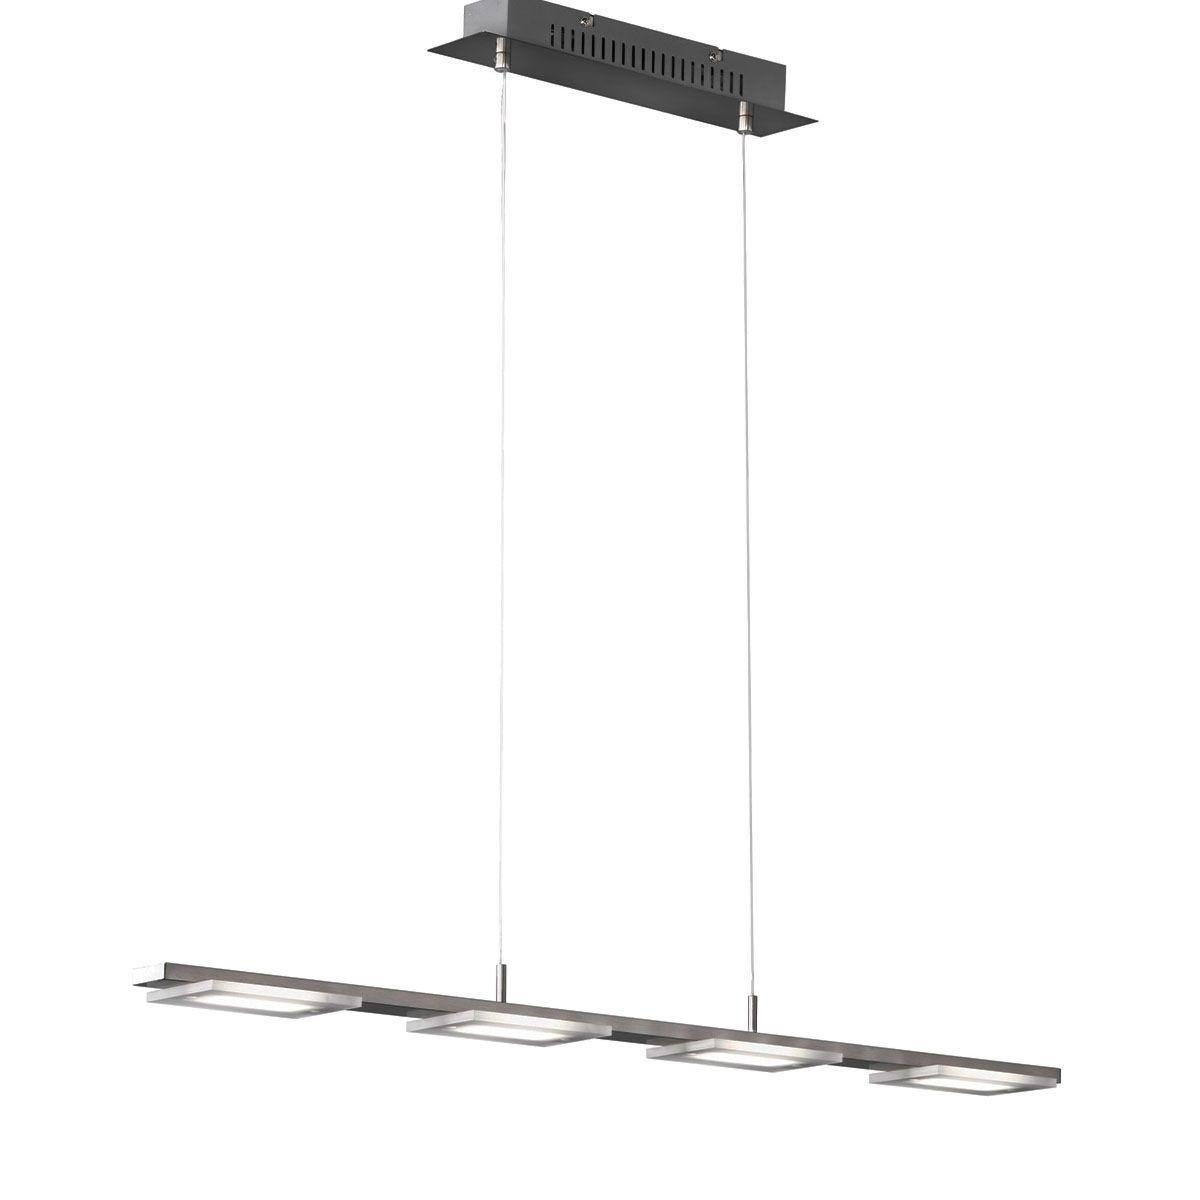 Action Verso 4 LED Lamp Pendant Ceiling Light - Nickel Matt Finish